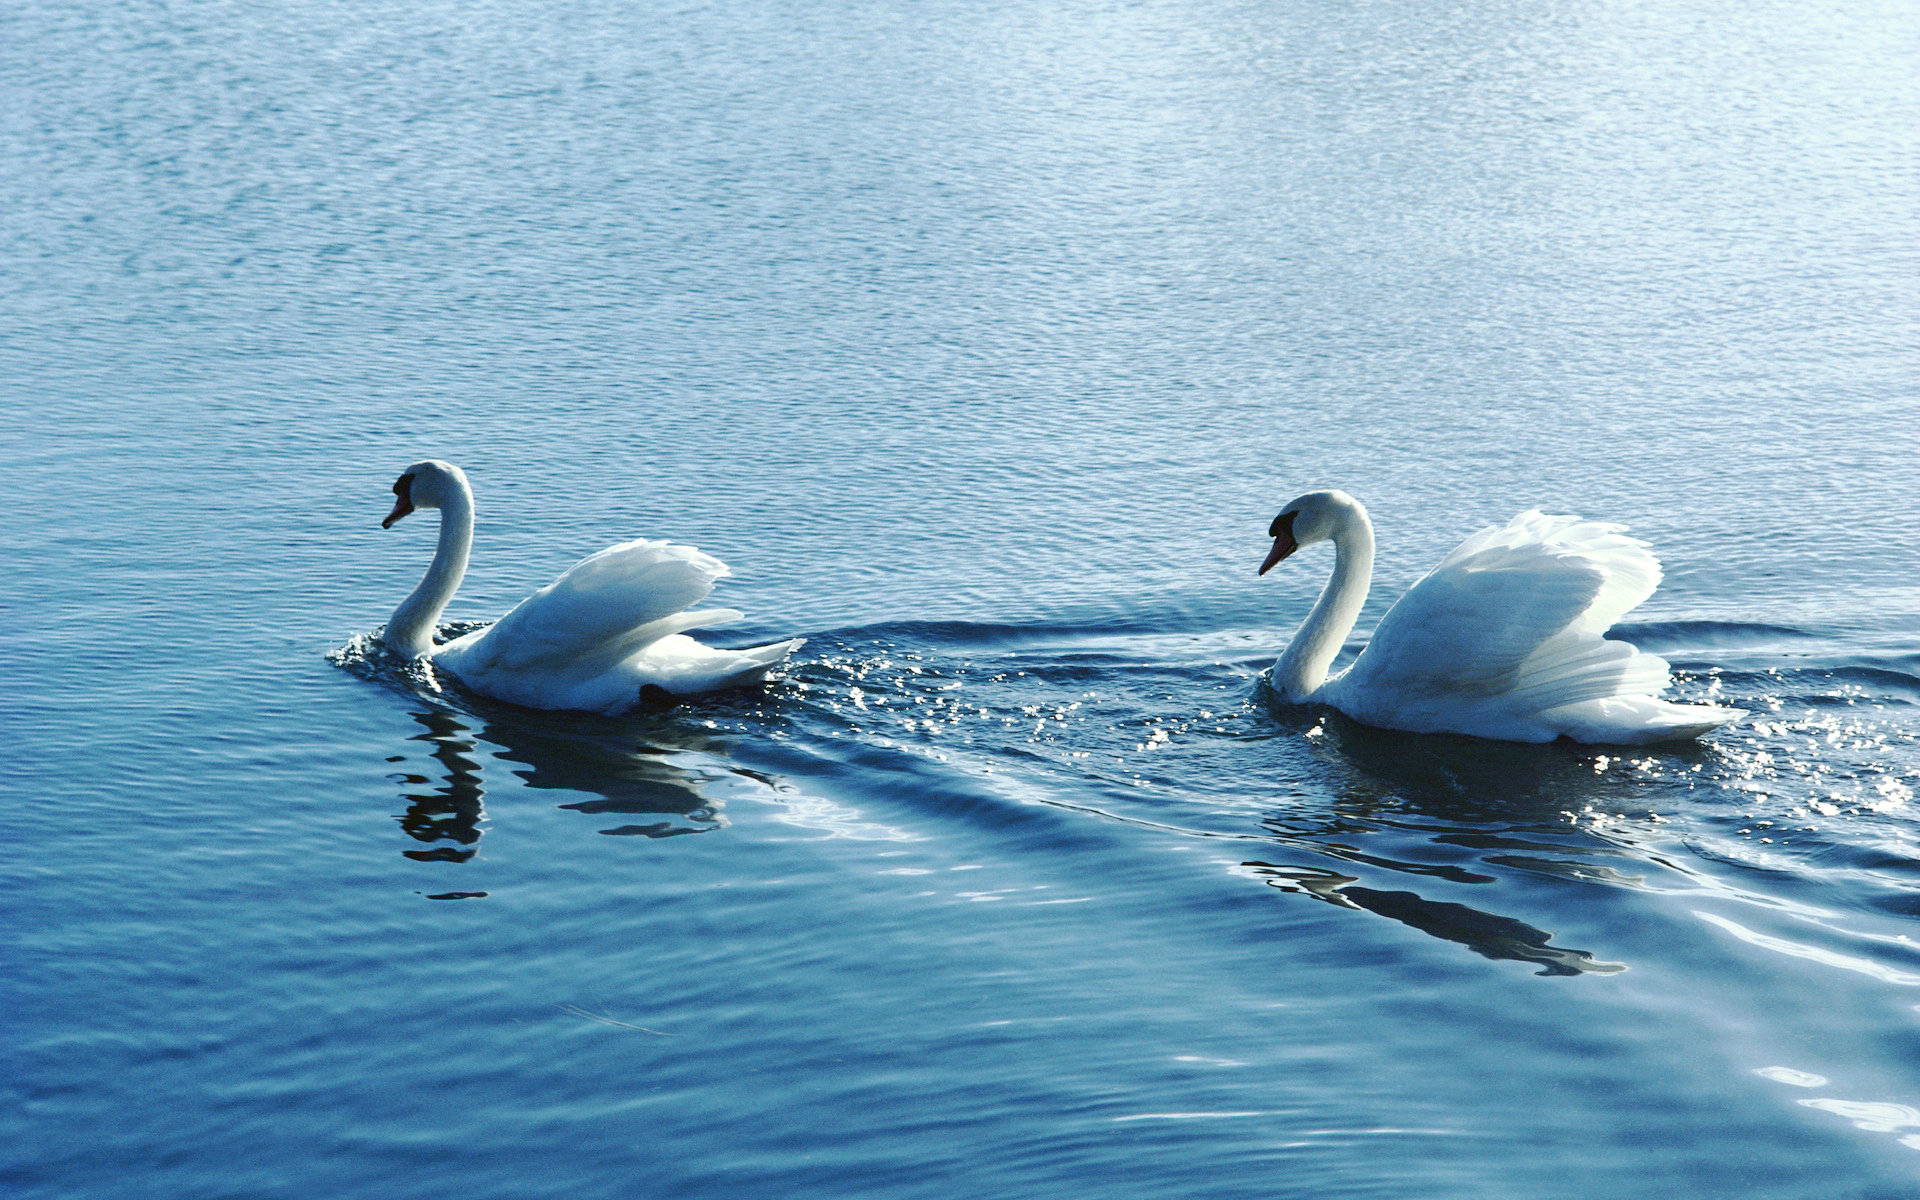 20 wonderful hd swan bird wallpapers - Swan wallpapers for desktop ...